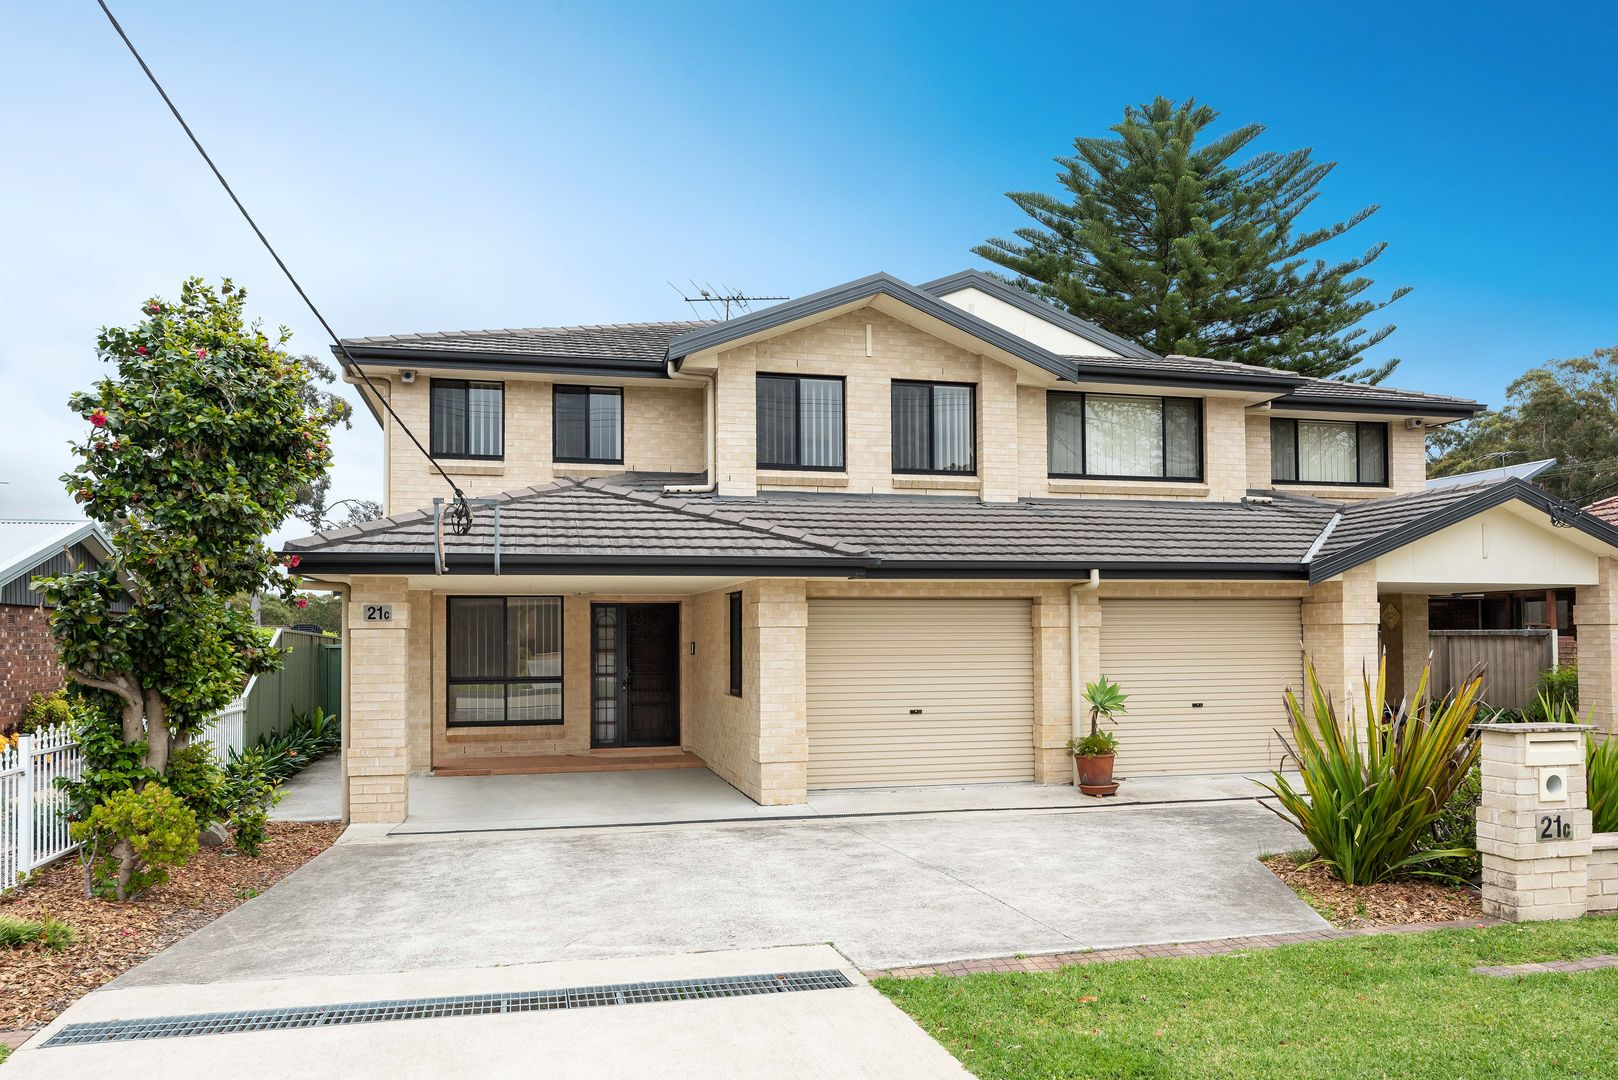 21C Linden Street, Sutherland NSW 2232, Image 0